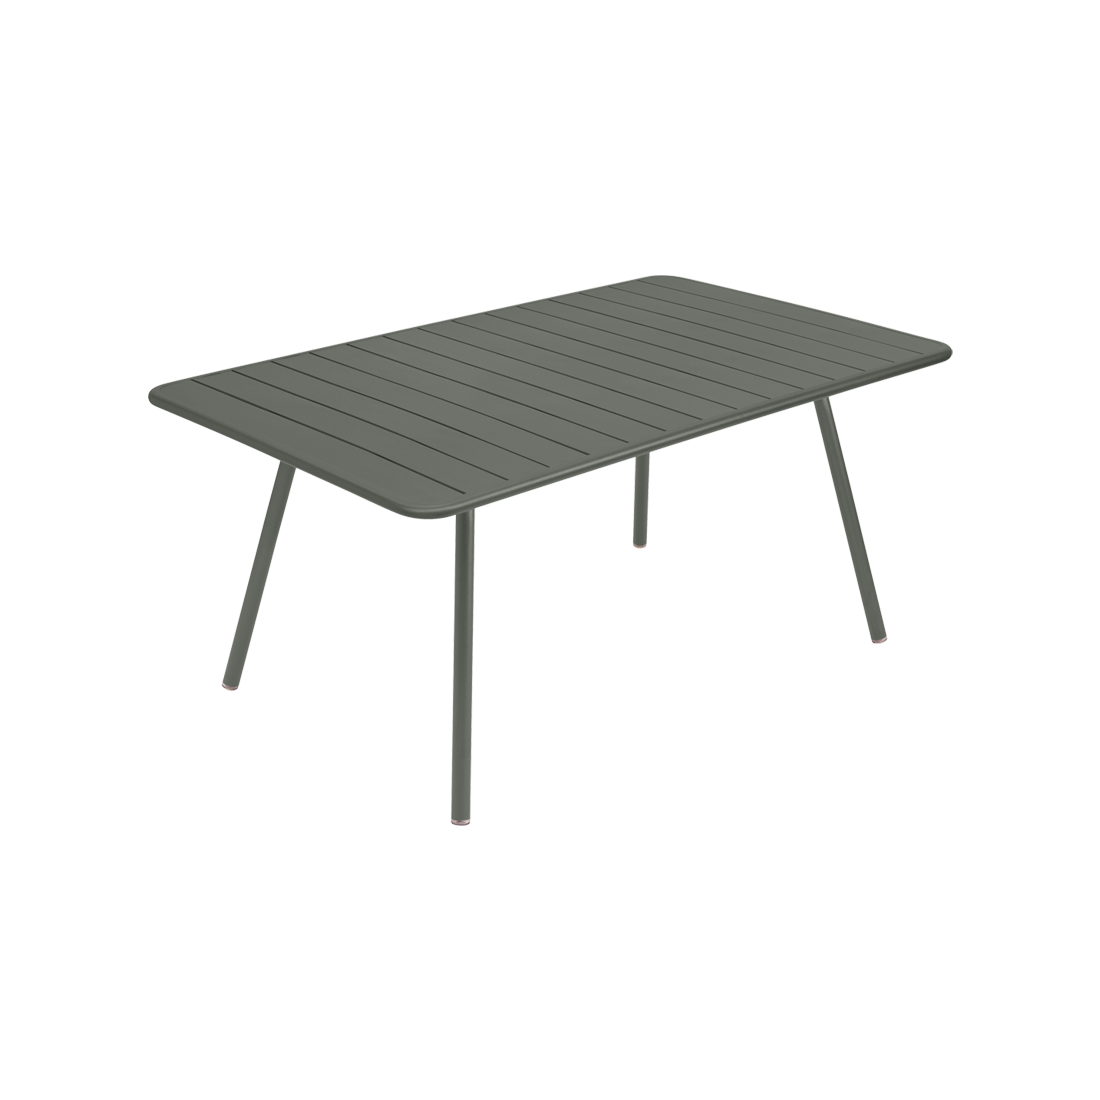 Table 165x100 cm Luxembourg, table de jardin, table jardin 8 personnes